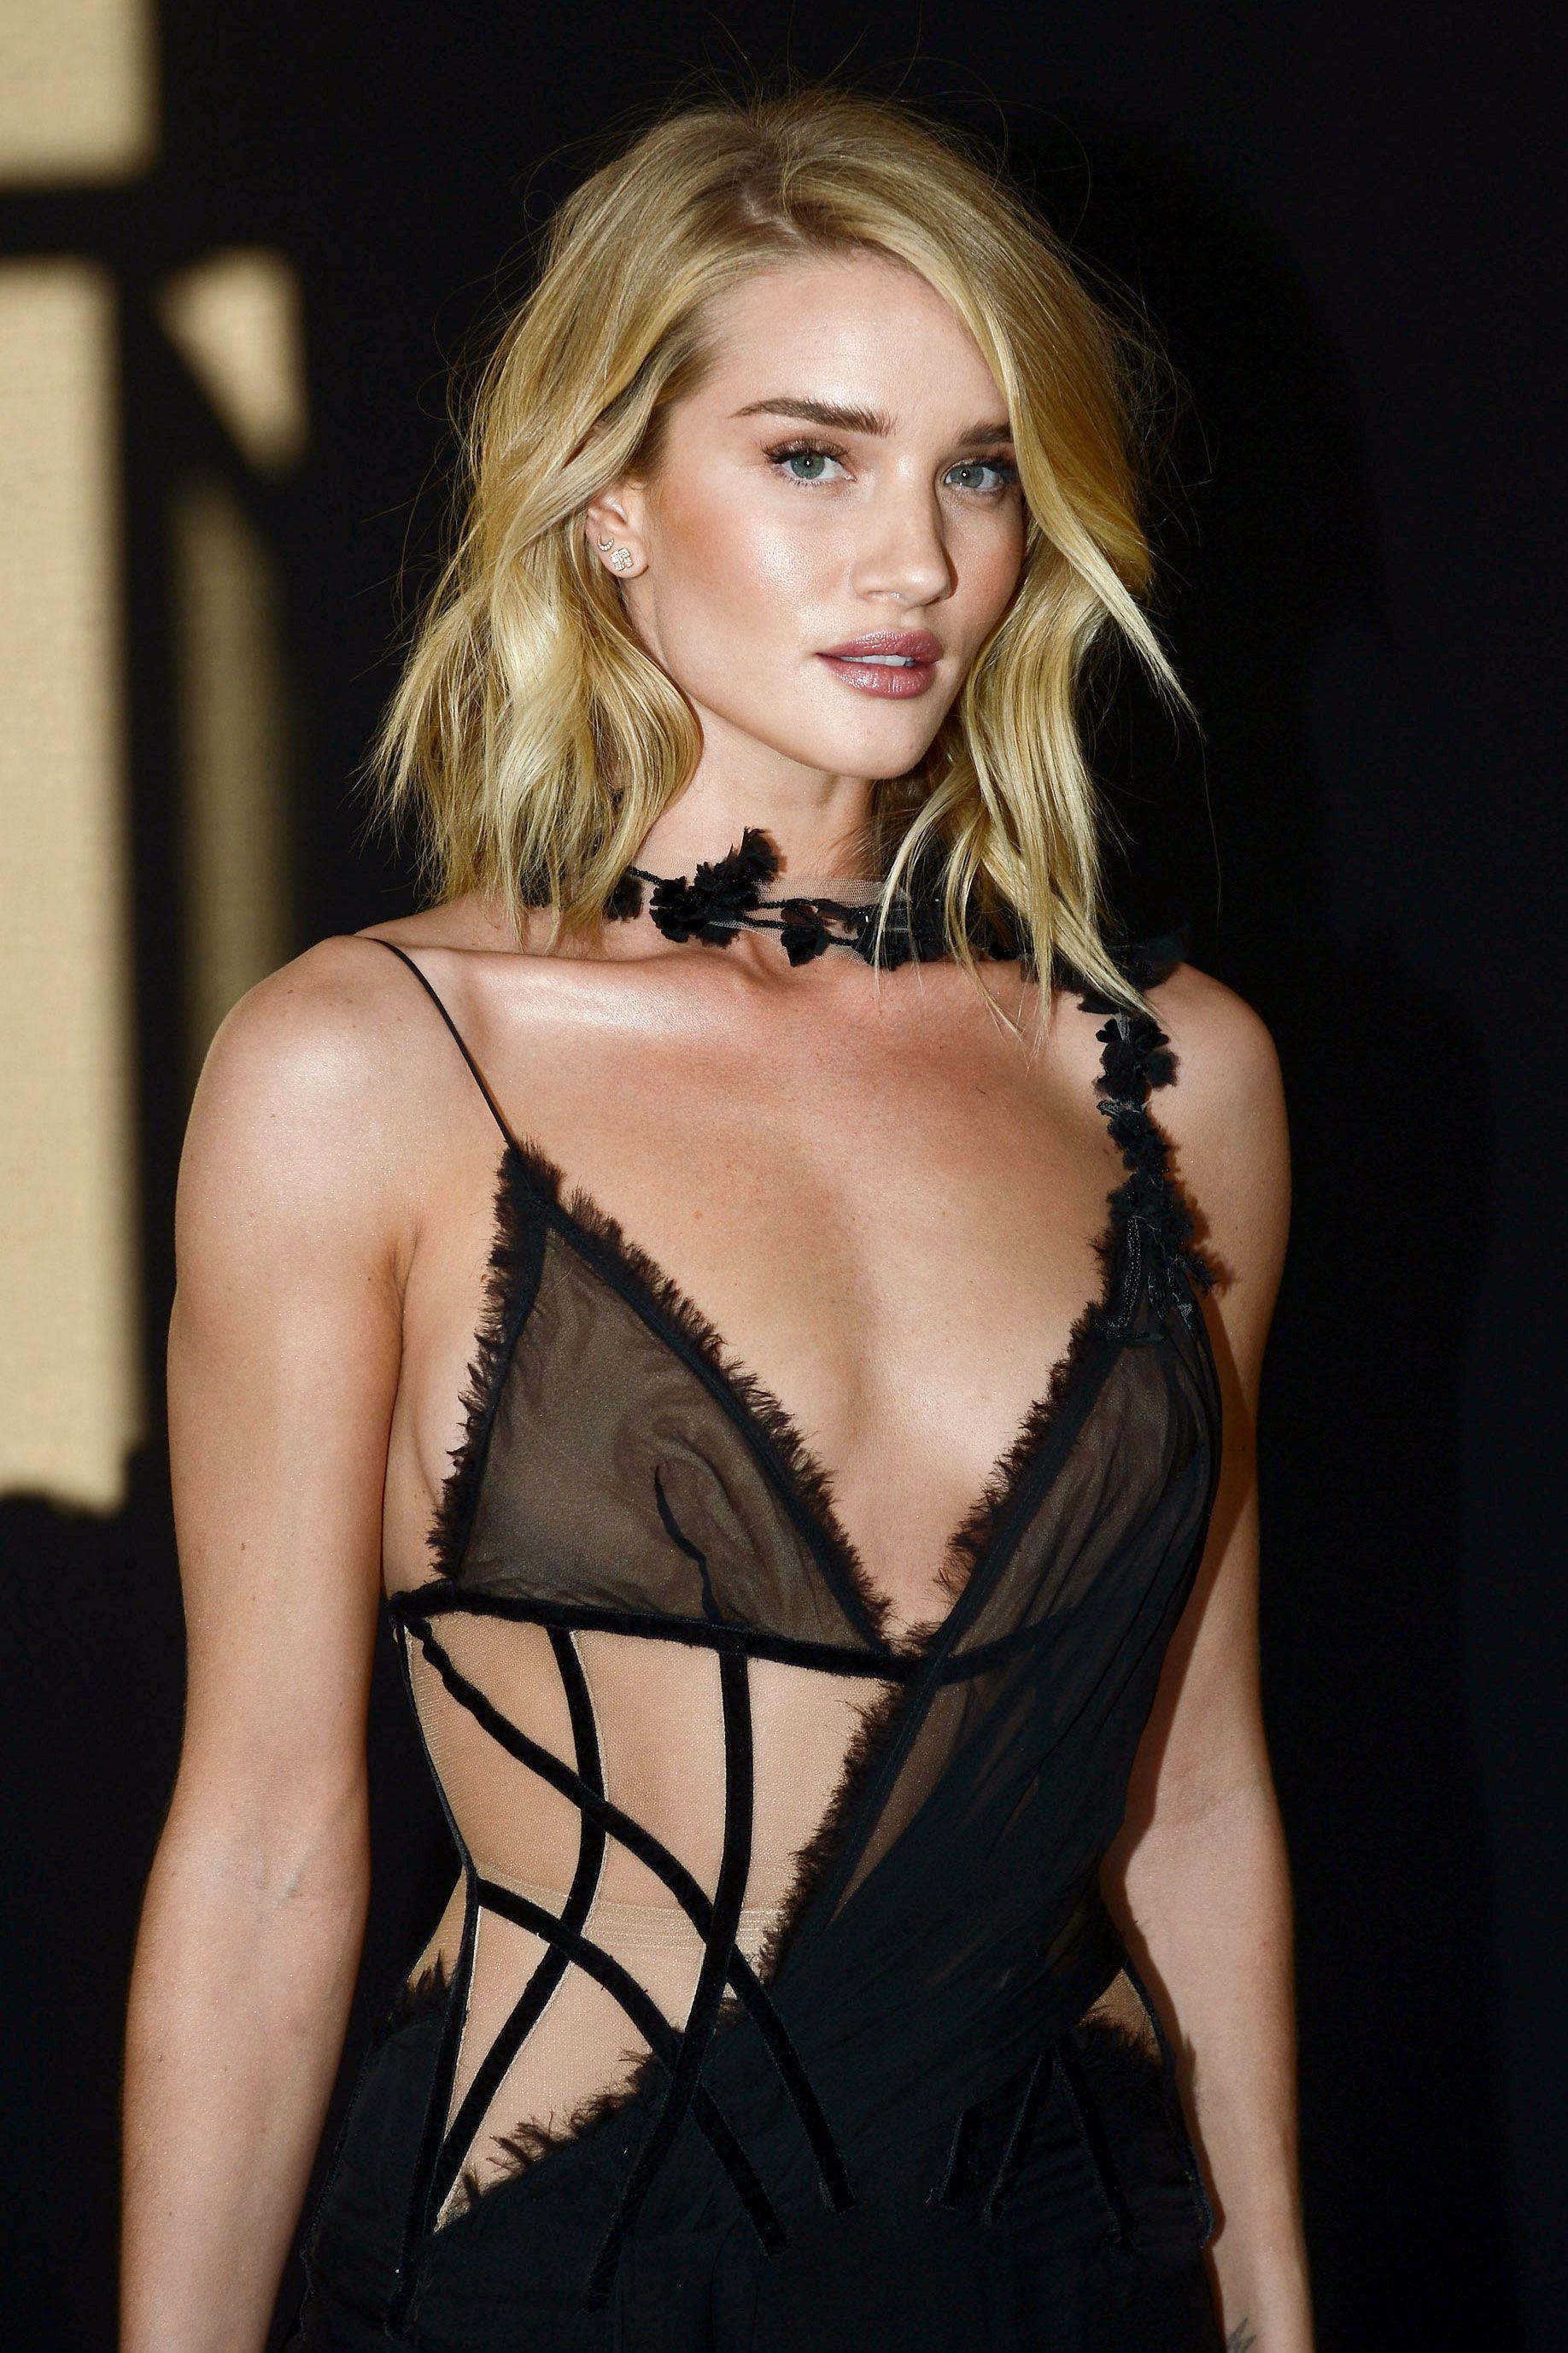 WINIFRED: Hollywood busty nipples